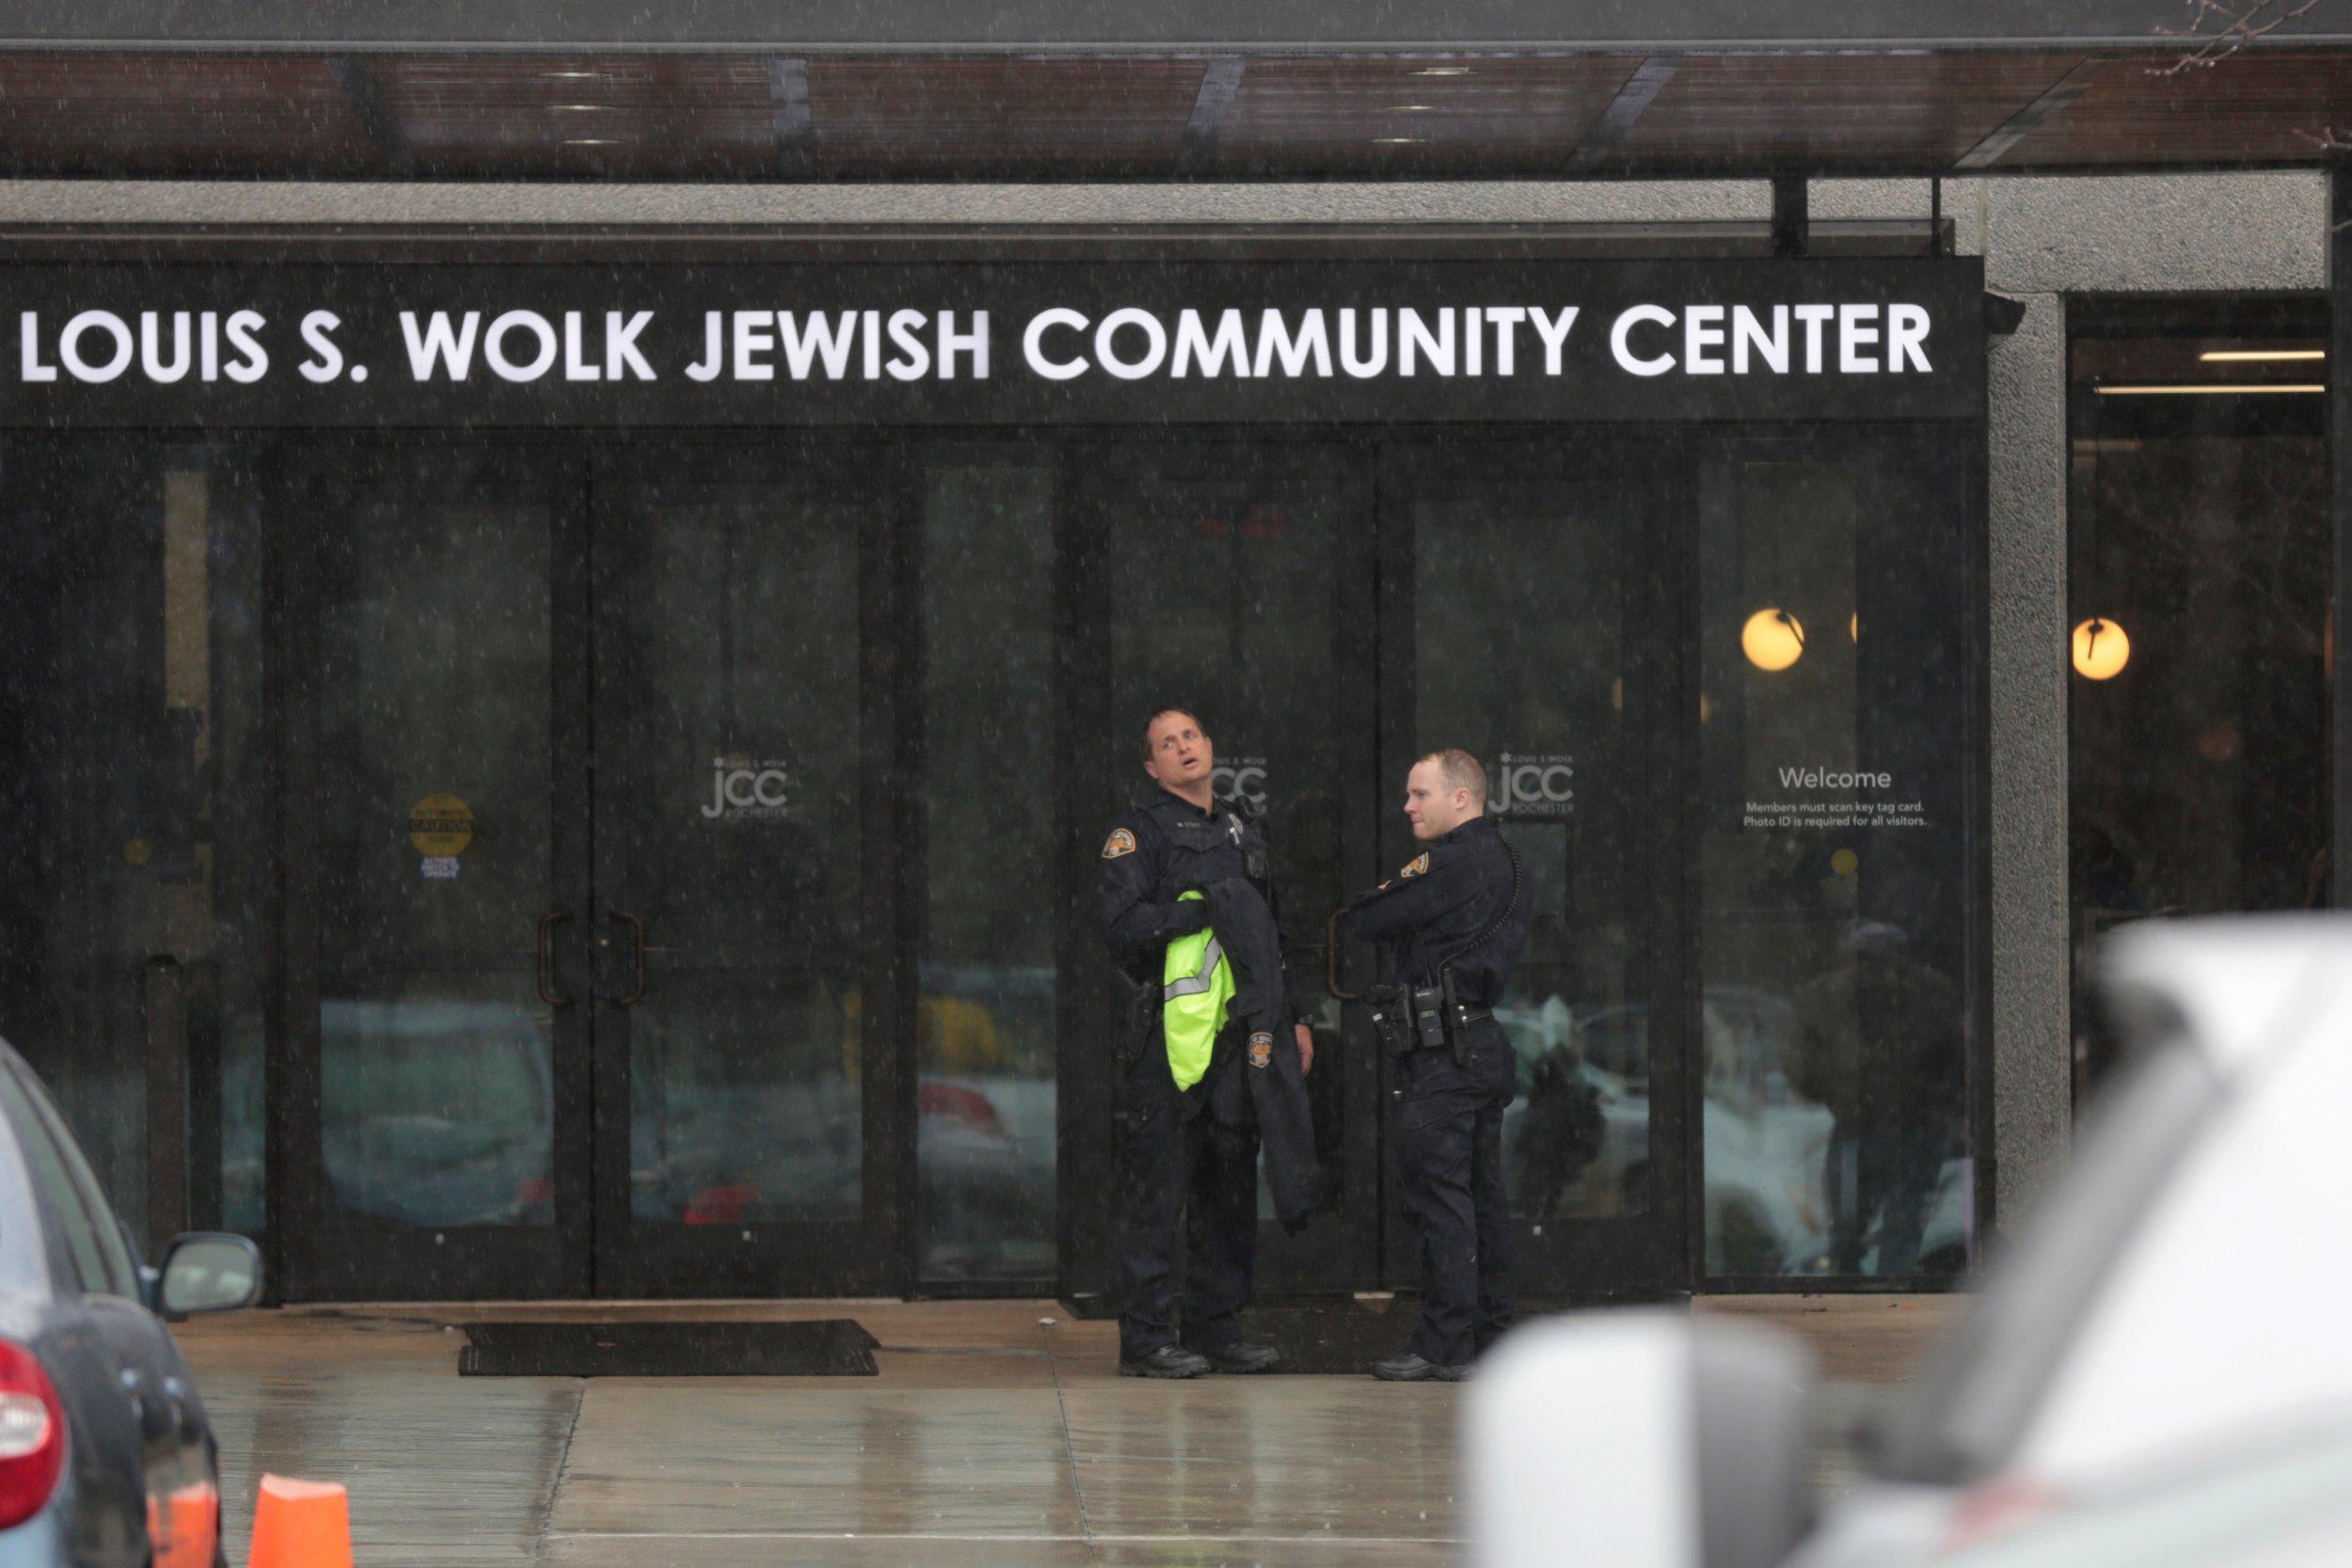 Jewish Community Centers